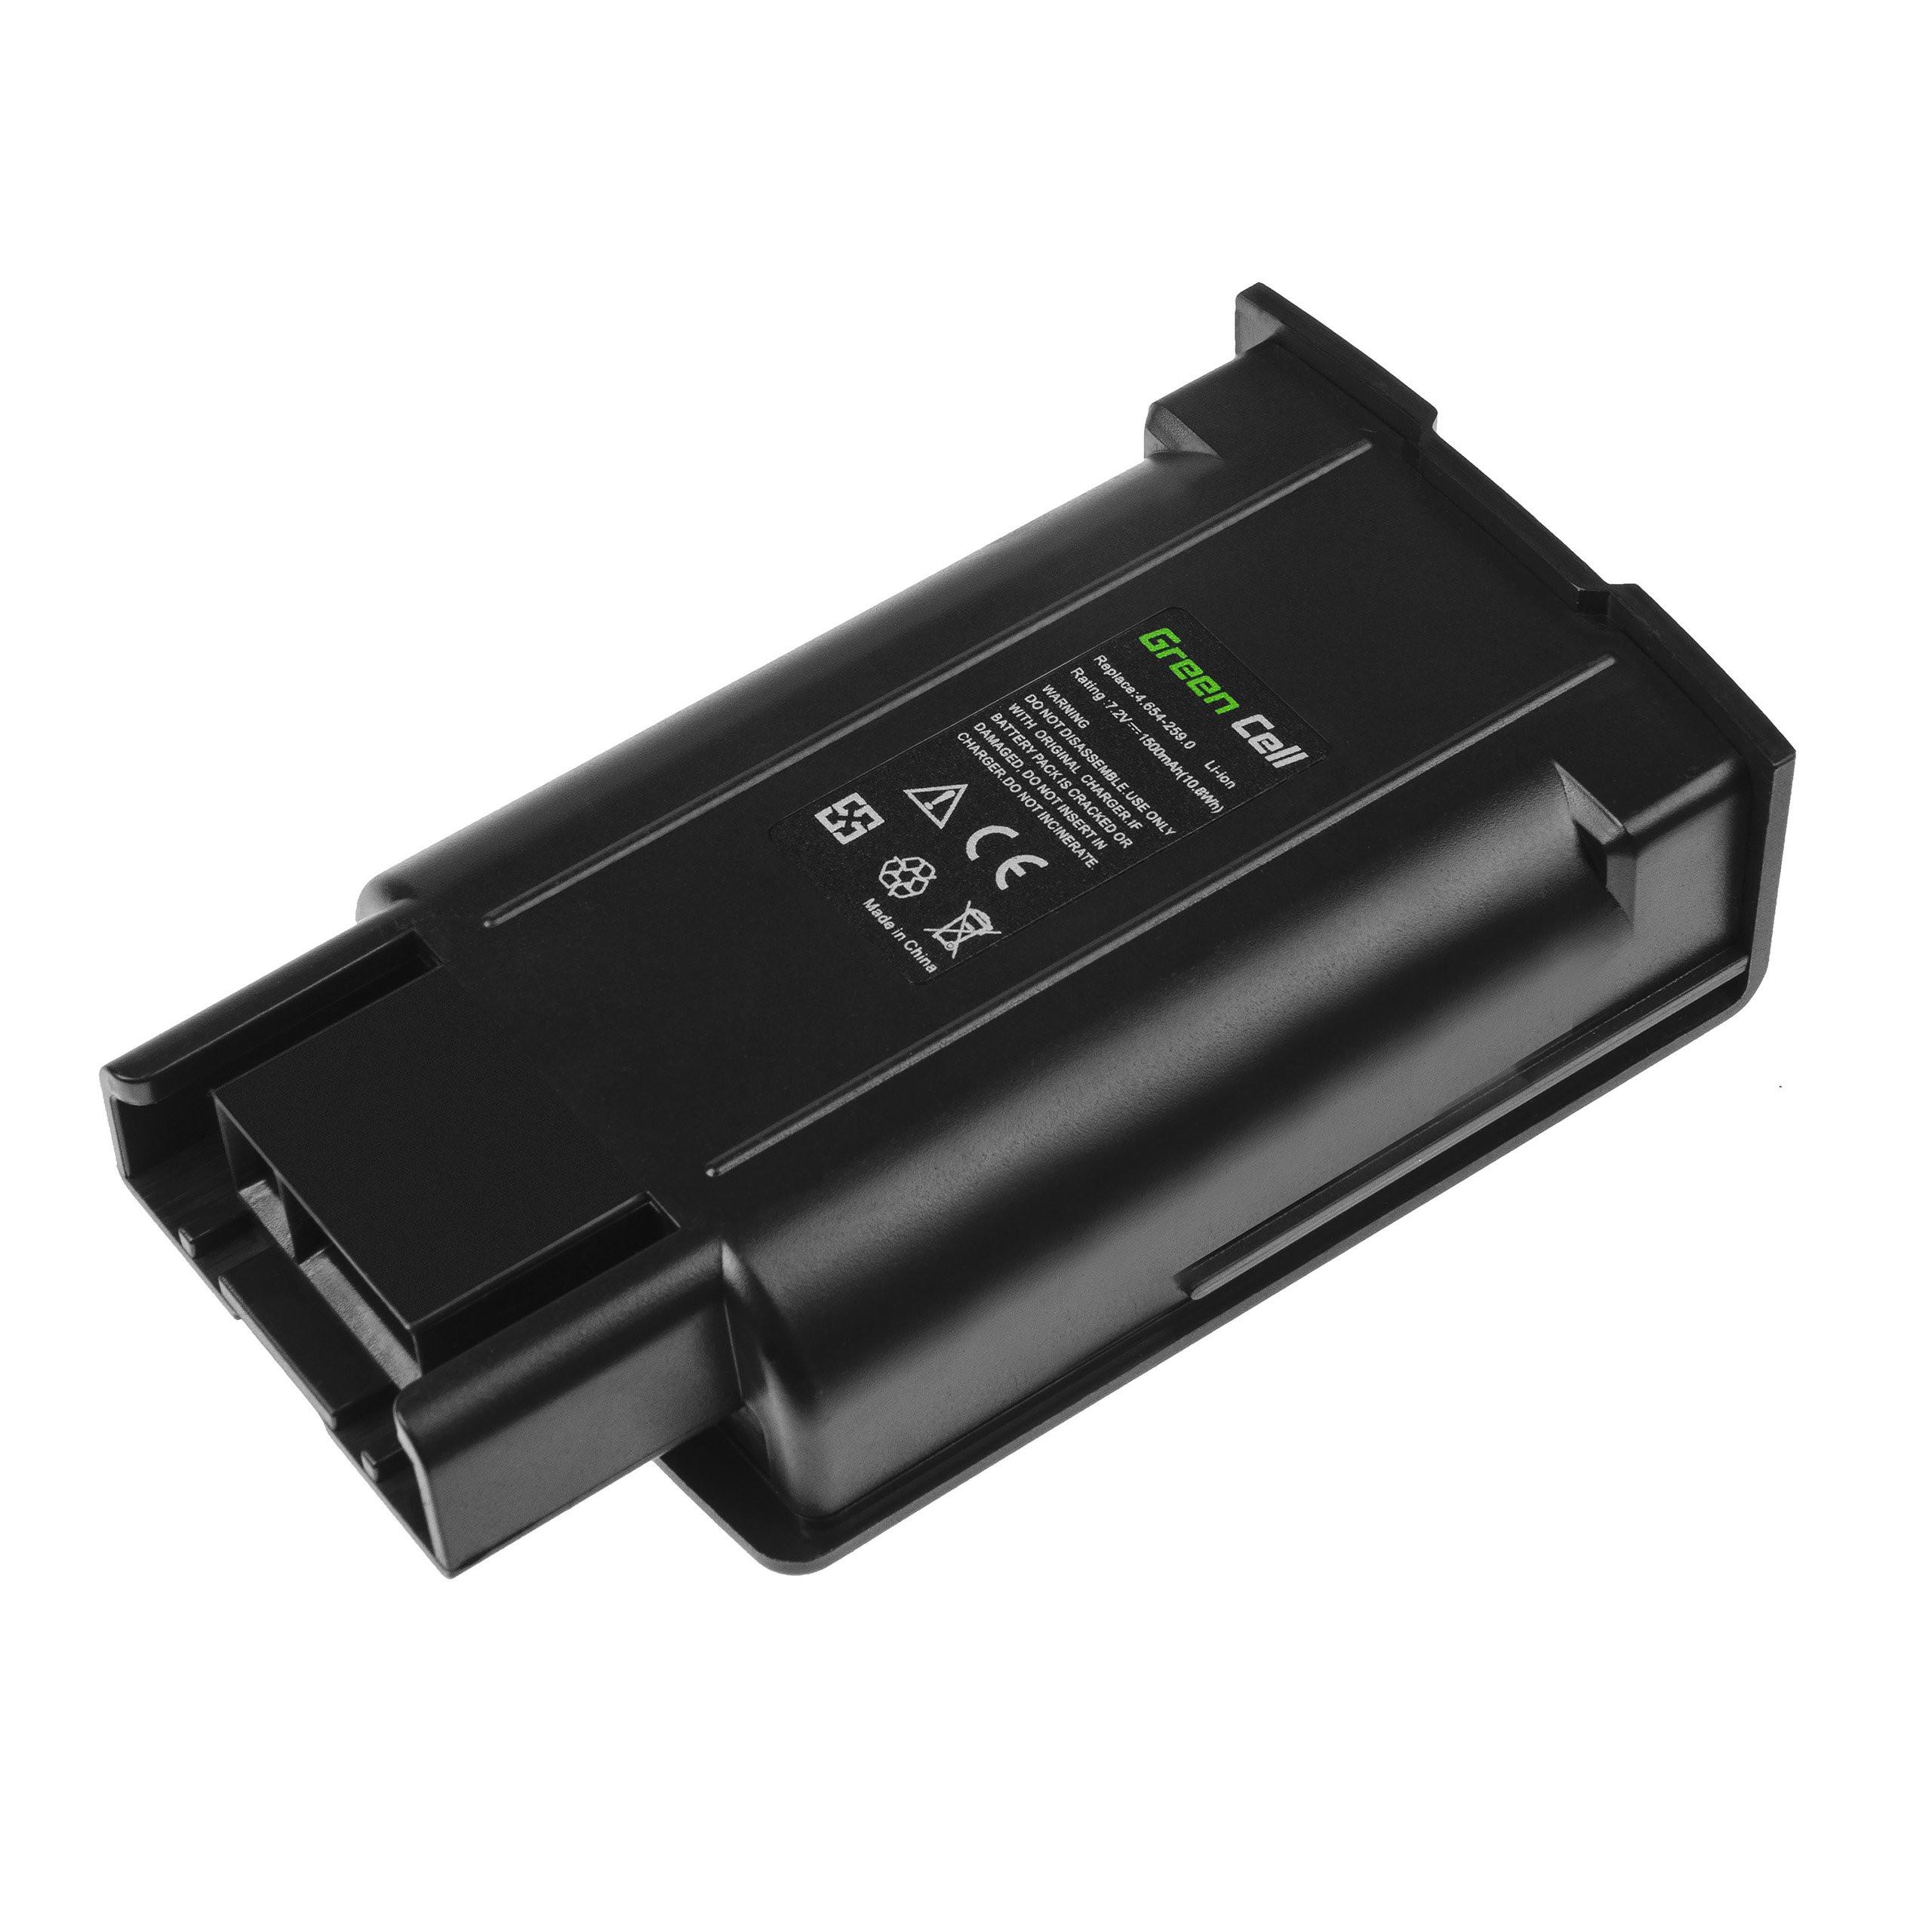 Baterie Green Cell Karcher EB 30/1 Electric Broom 7.2V 1500mAh Li-ion - neoriginální